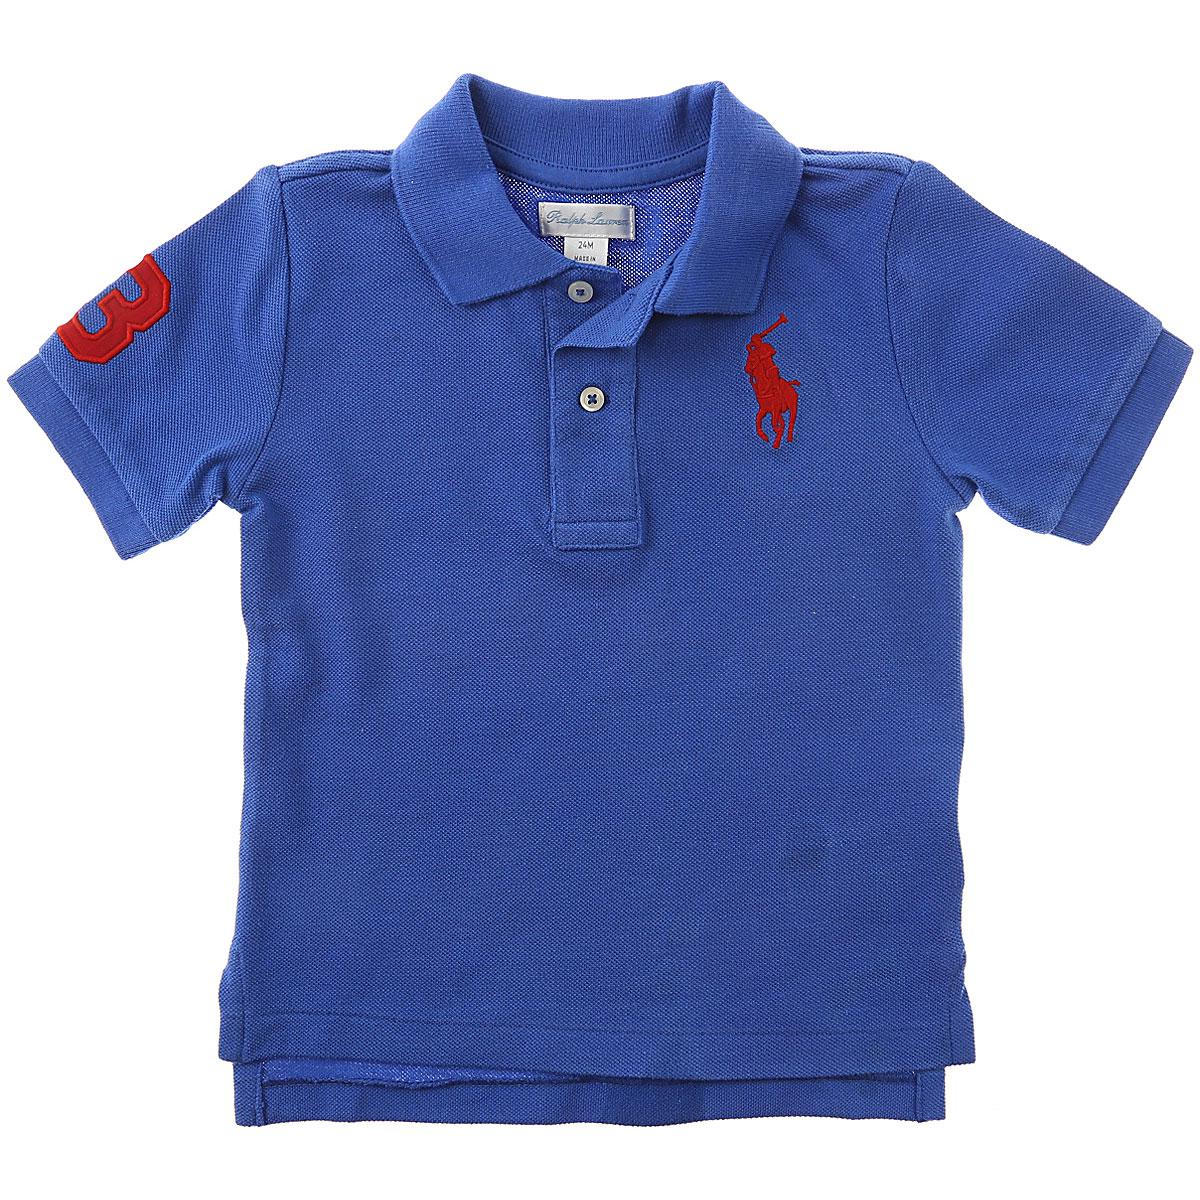 Lyst Ralph Lauren Baby Polo Shirt For Boys On Sale In Blue For Men